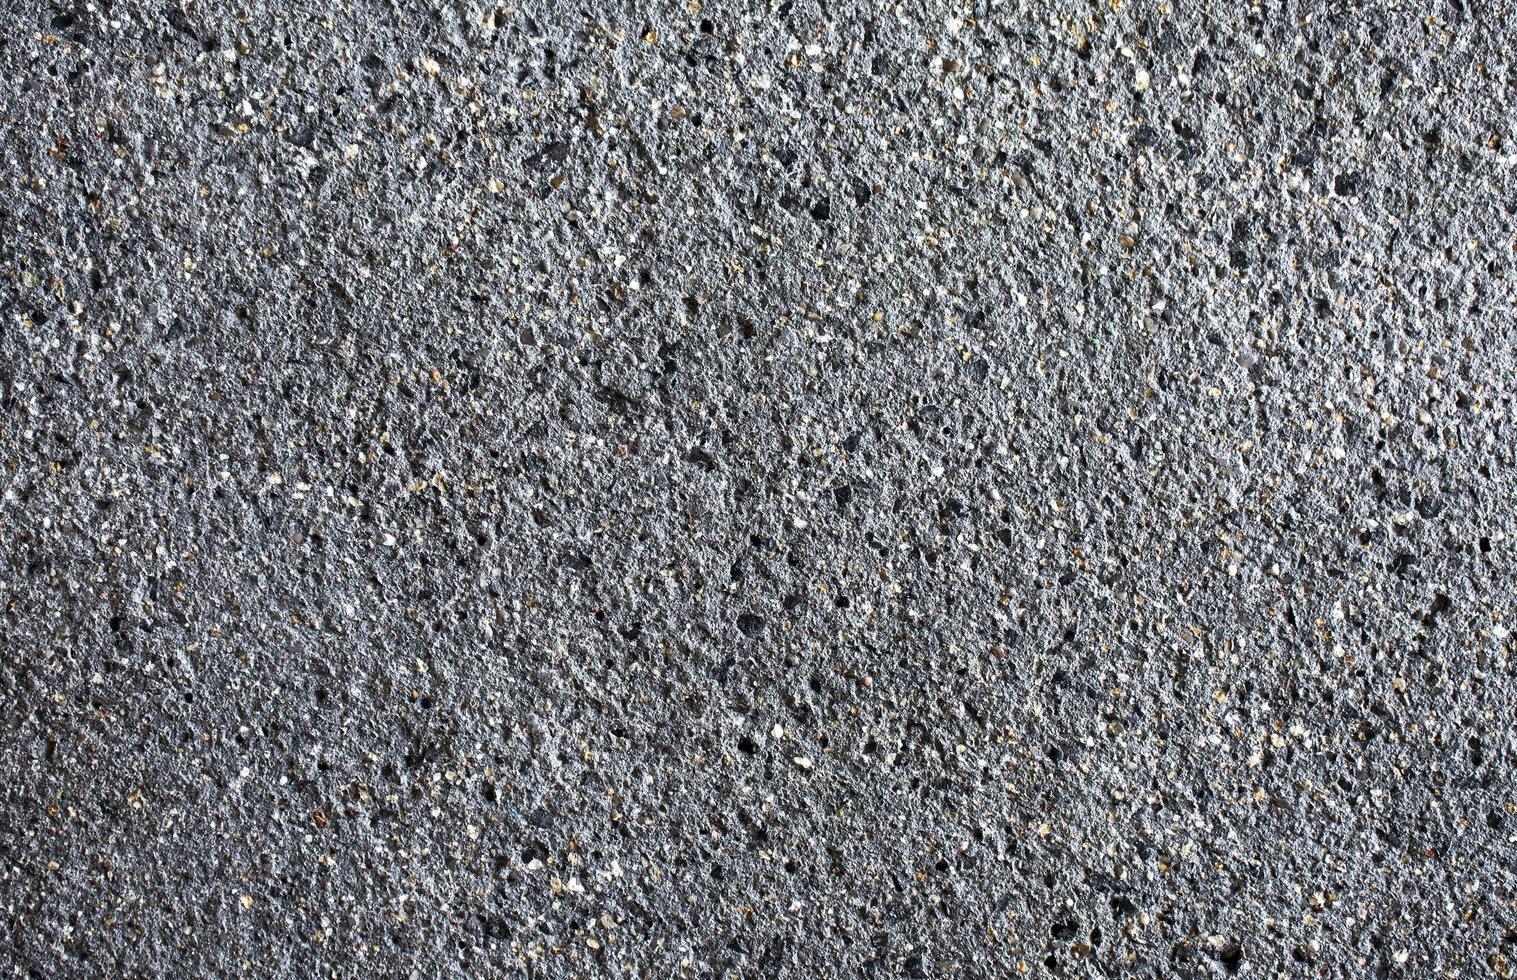 Dirty Grunge Stone Wall Background photo